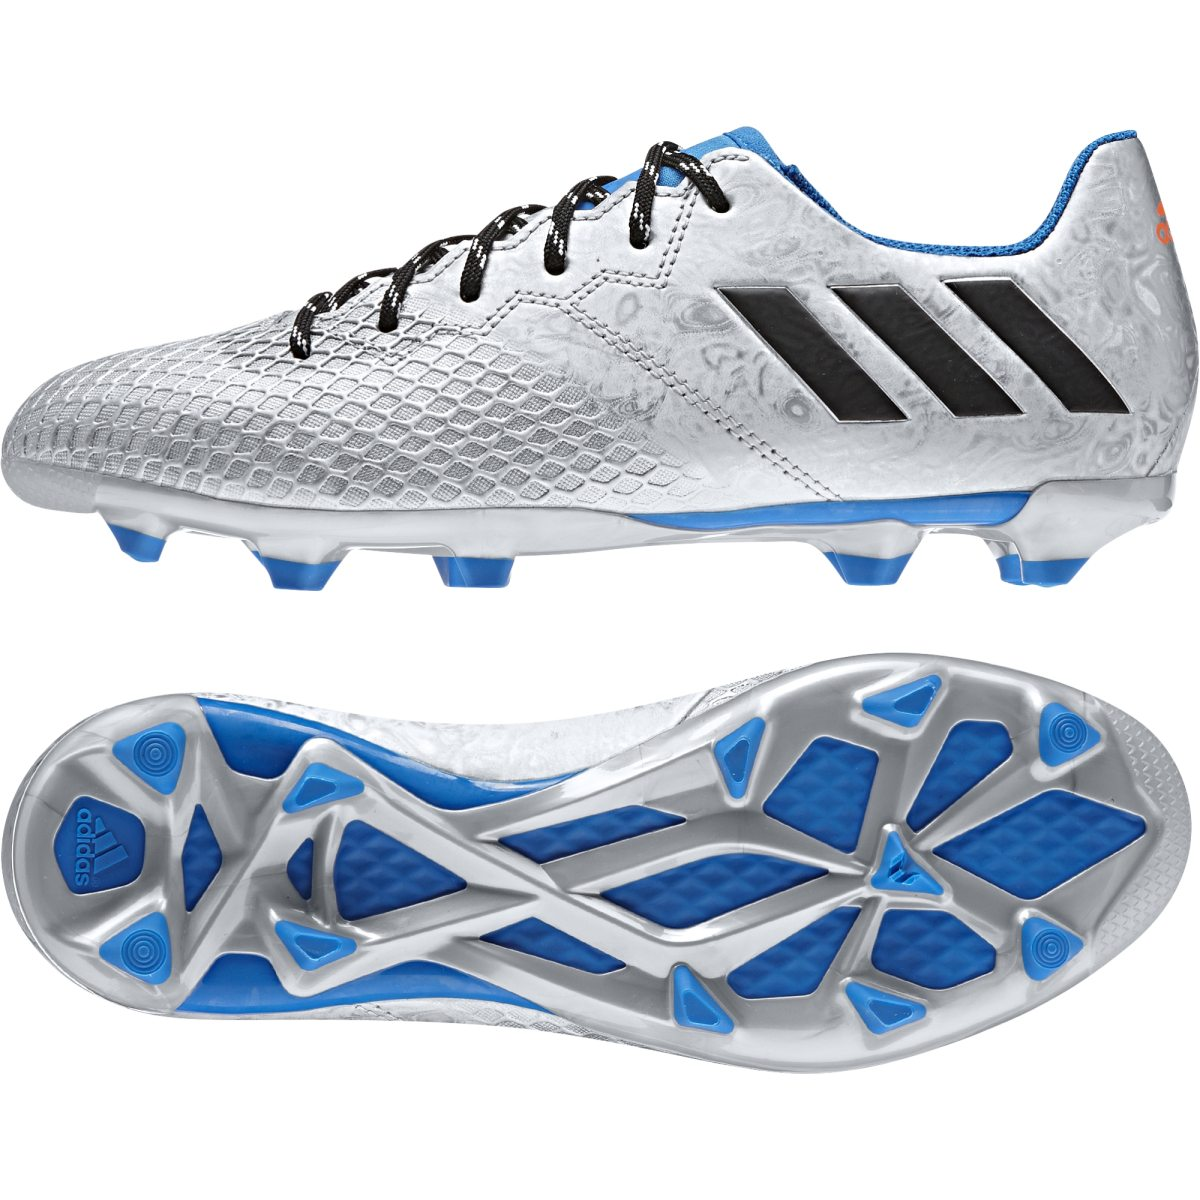 new product ab8bb 32213 adidas messi 16.3 fg ag ec fotbollssko junior fotbollsskor